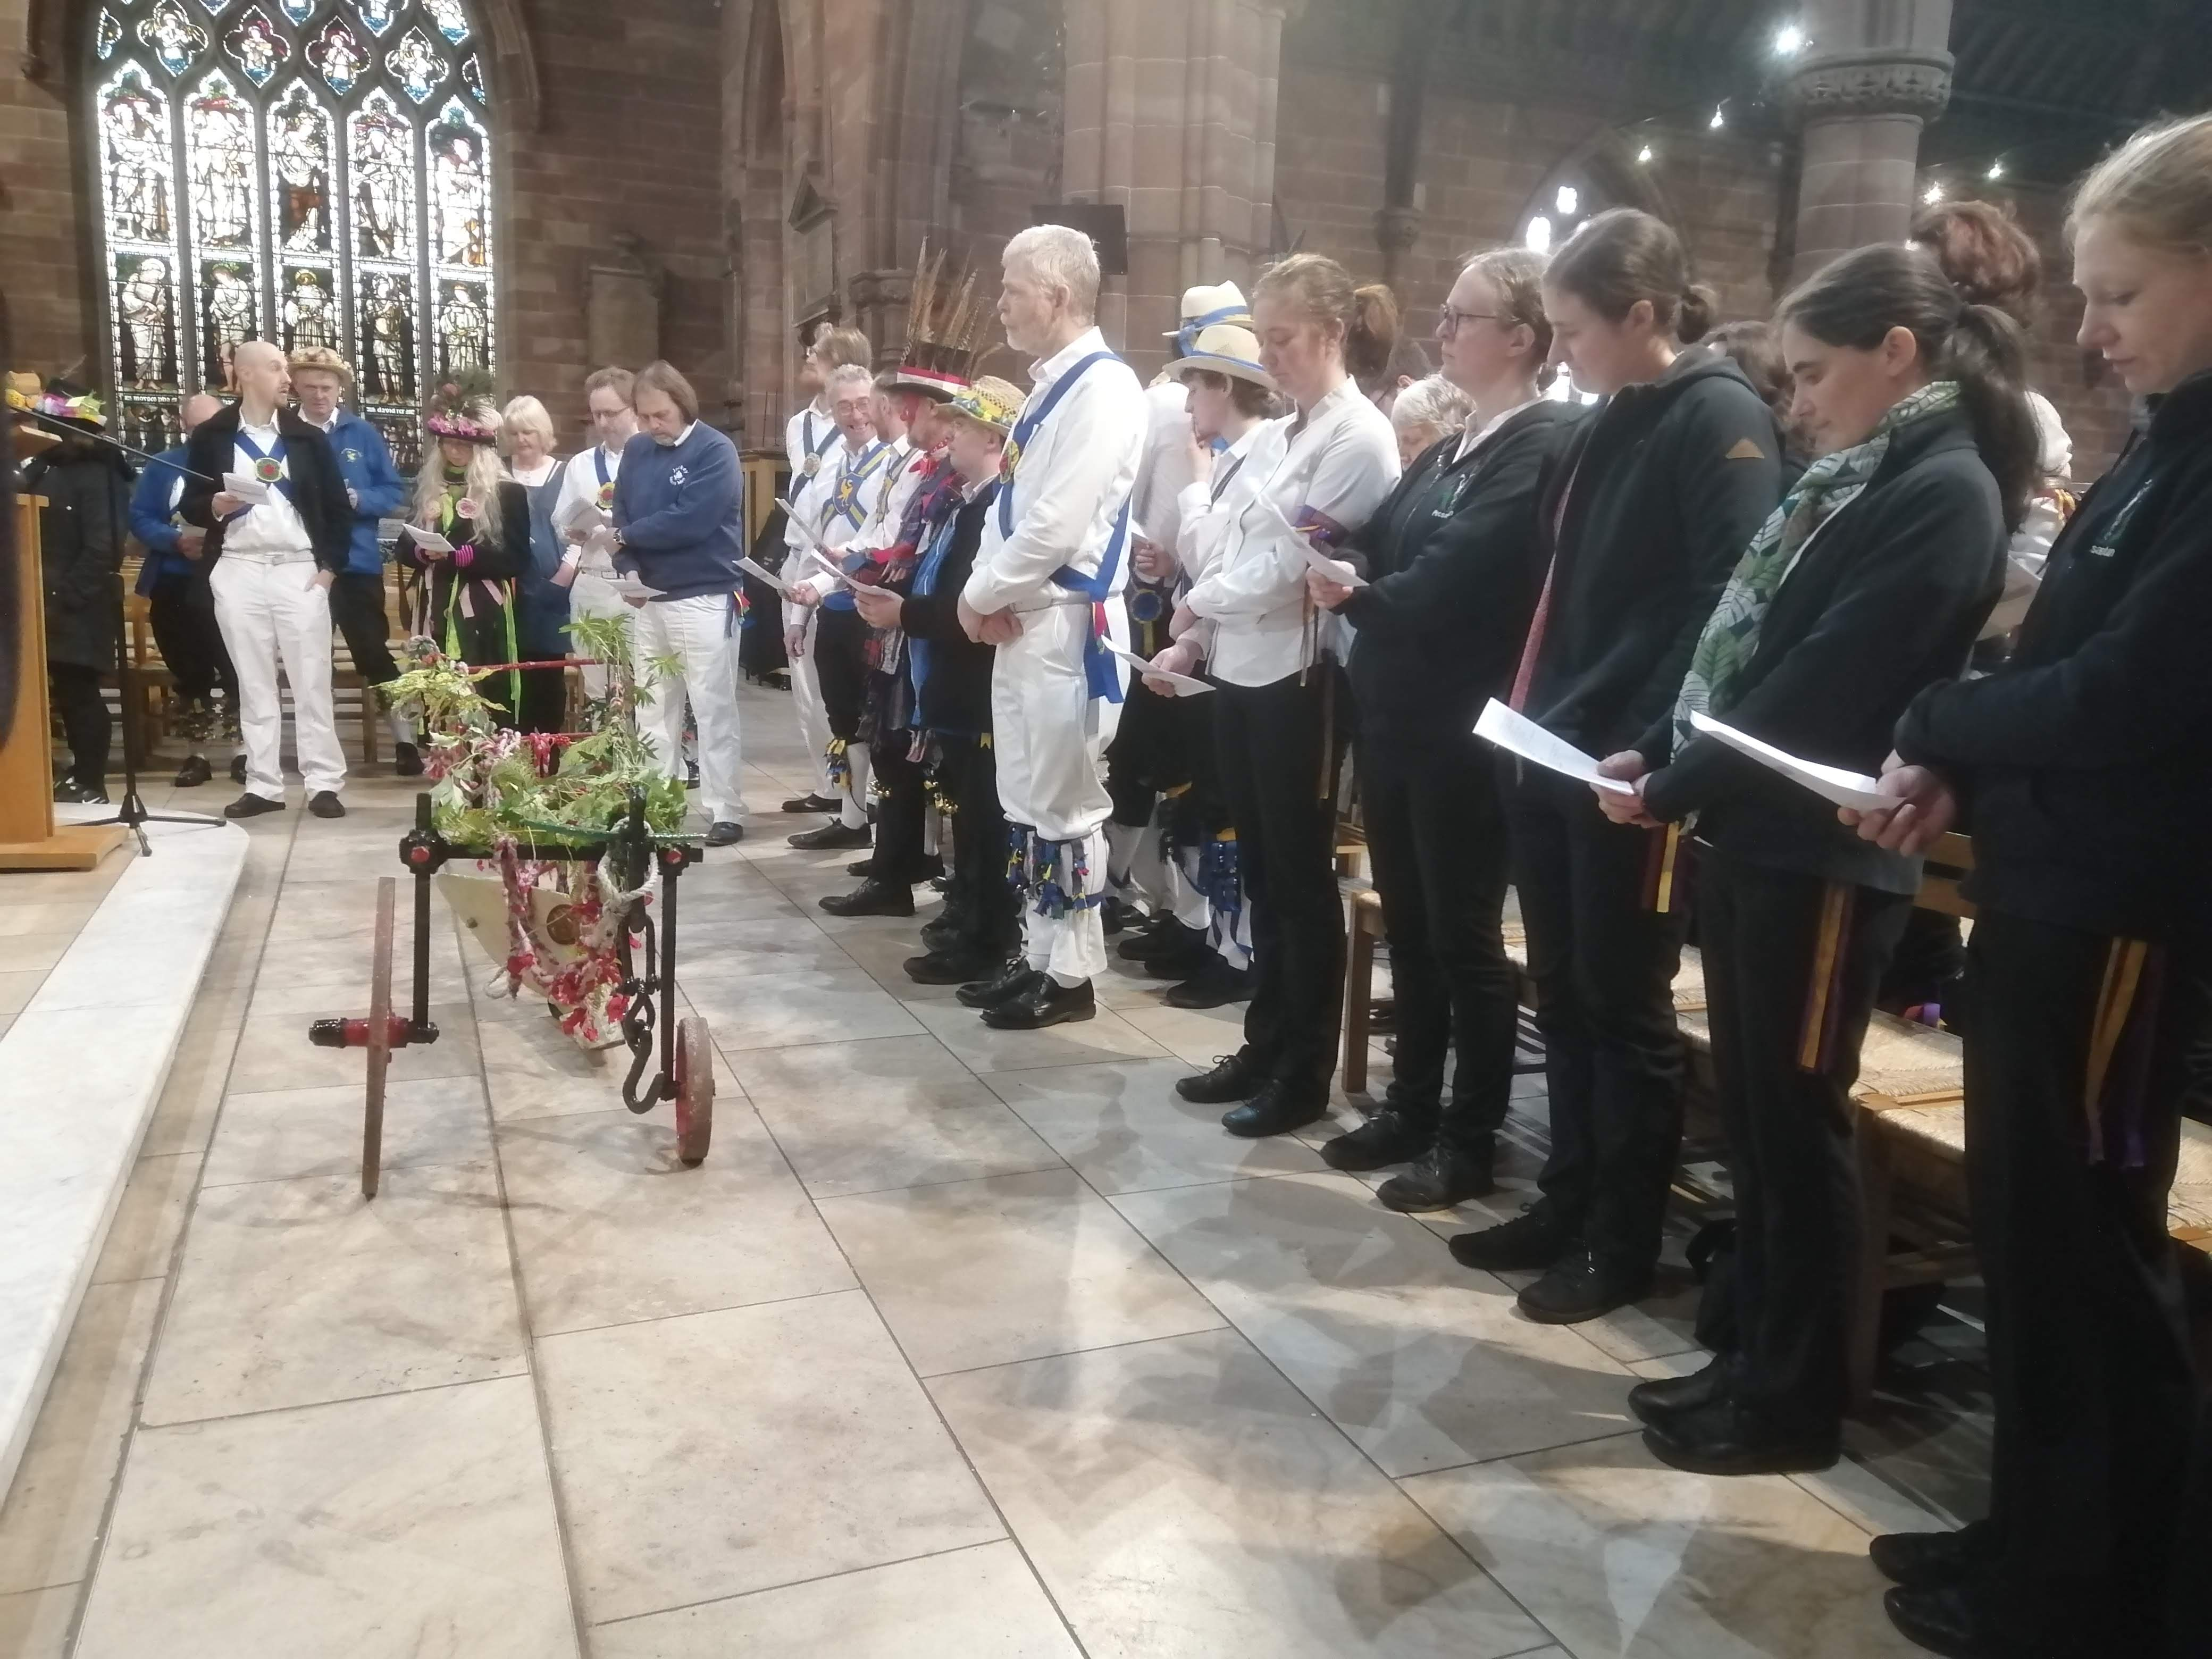 Plough Tour - in St. Martin's Church